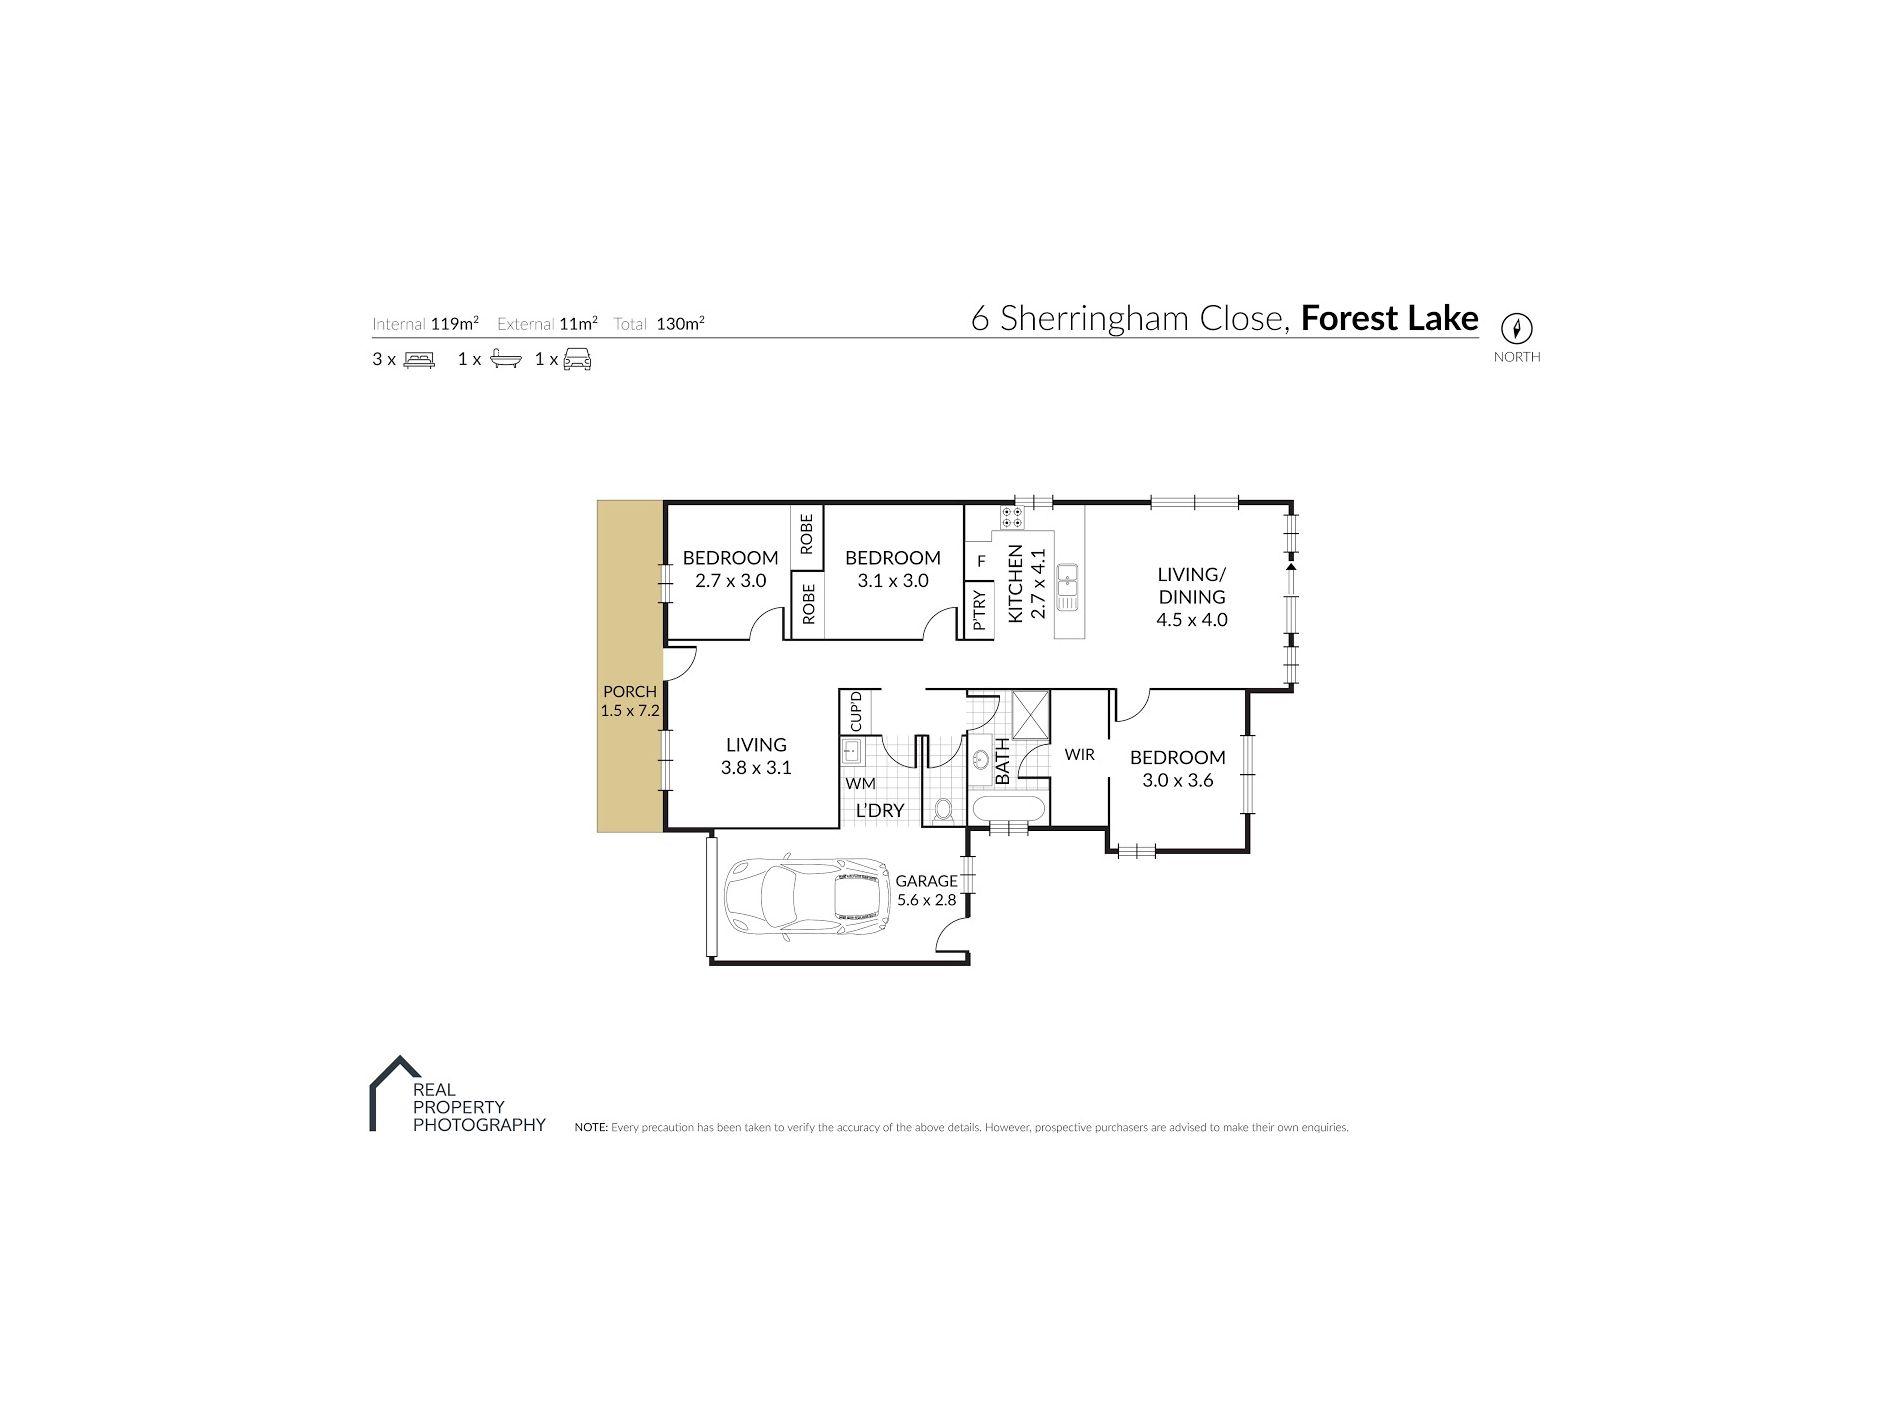 6 Sherringham Close, Forest Lake